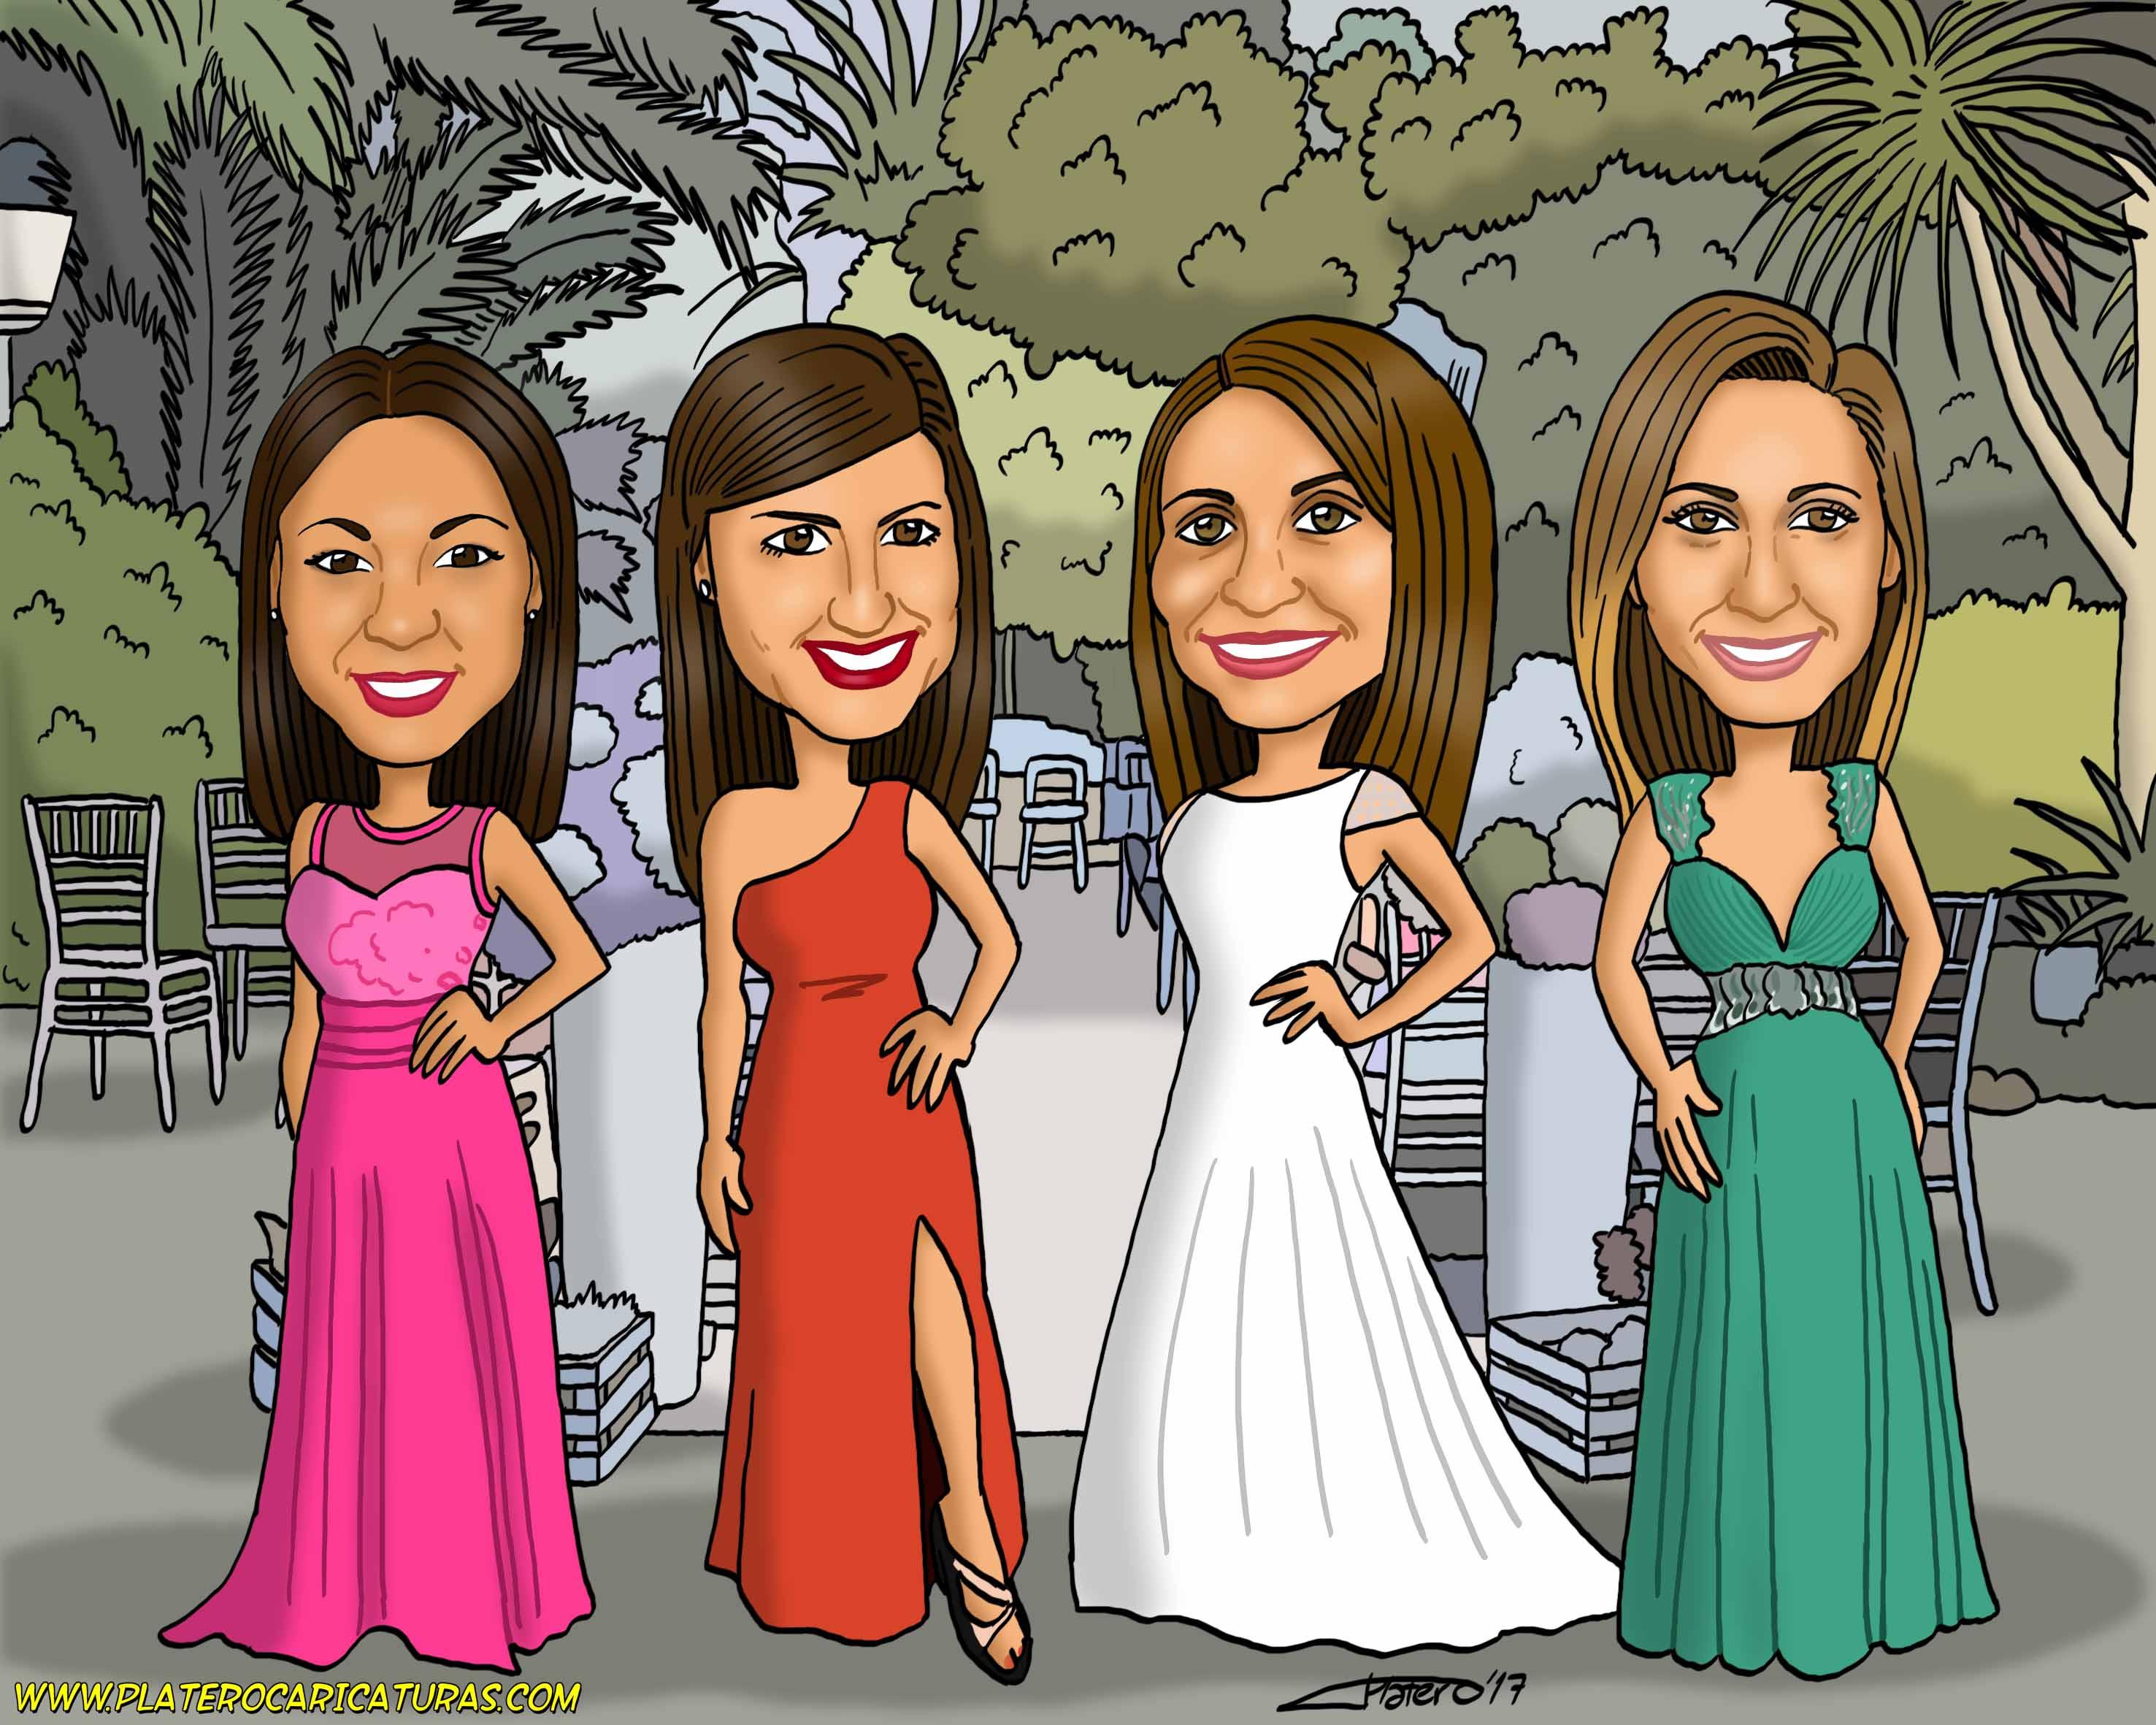 4 chicas_caricatura_caricaturas_platerocaricaturas